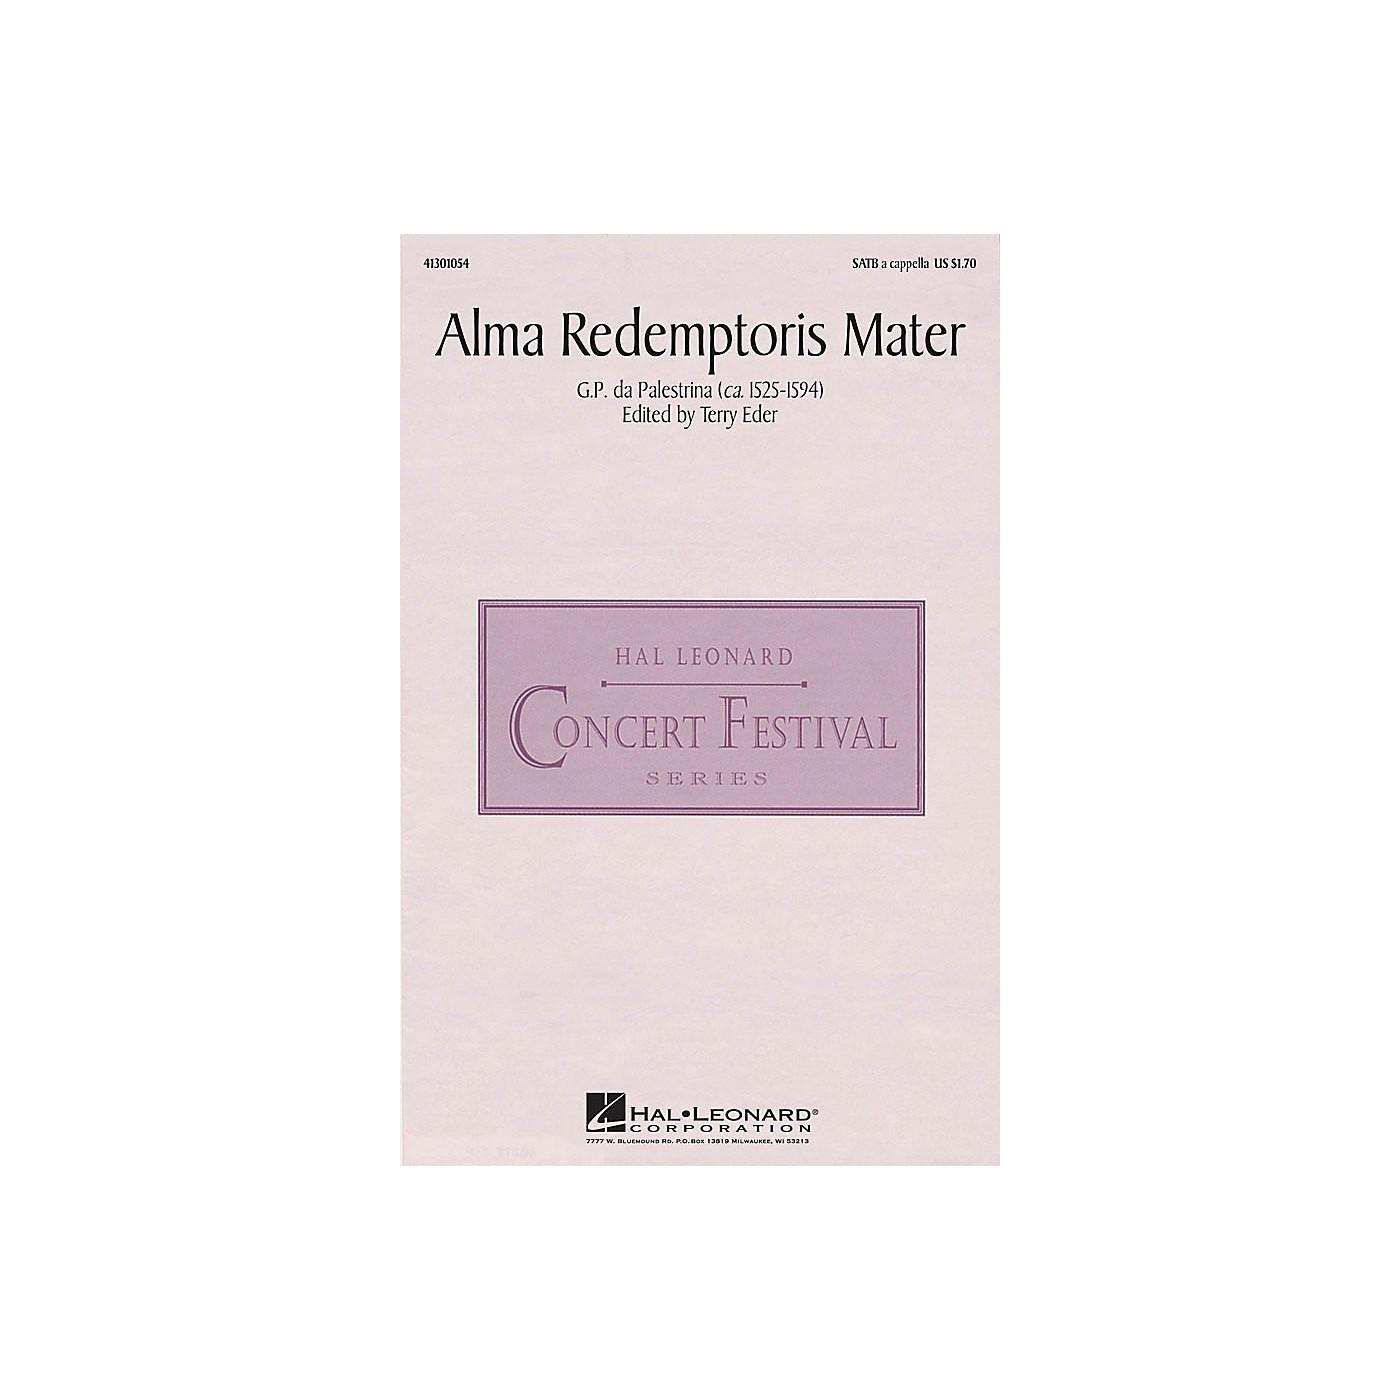 Hal Leonard Alma Redemptoris Mater SATB a cappella arranged by Terry Eder thumbnail